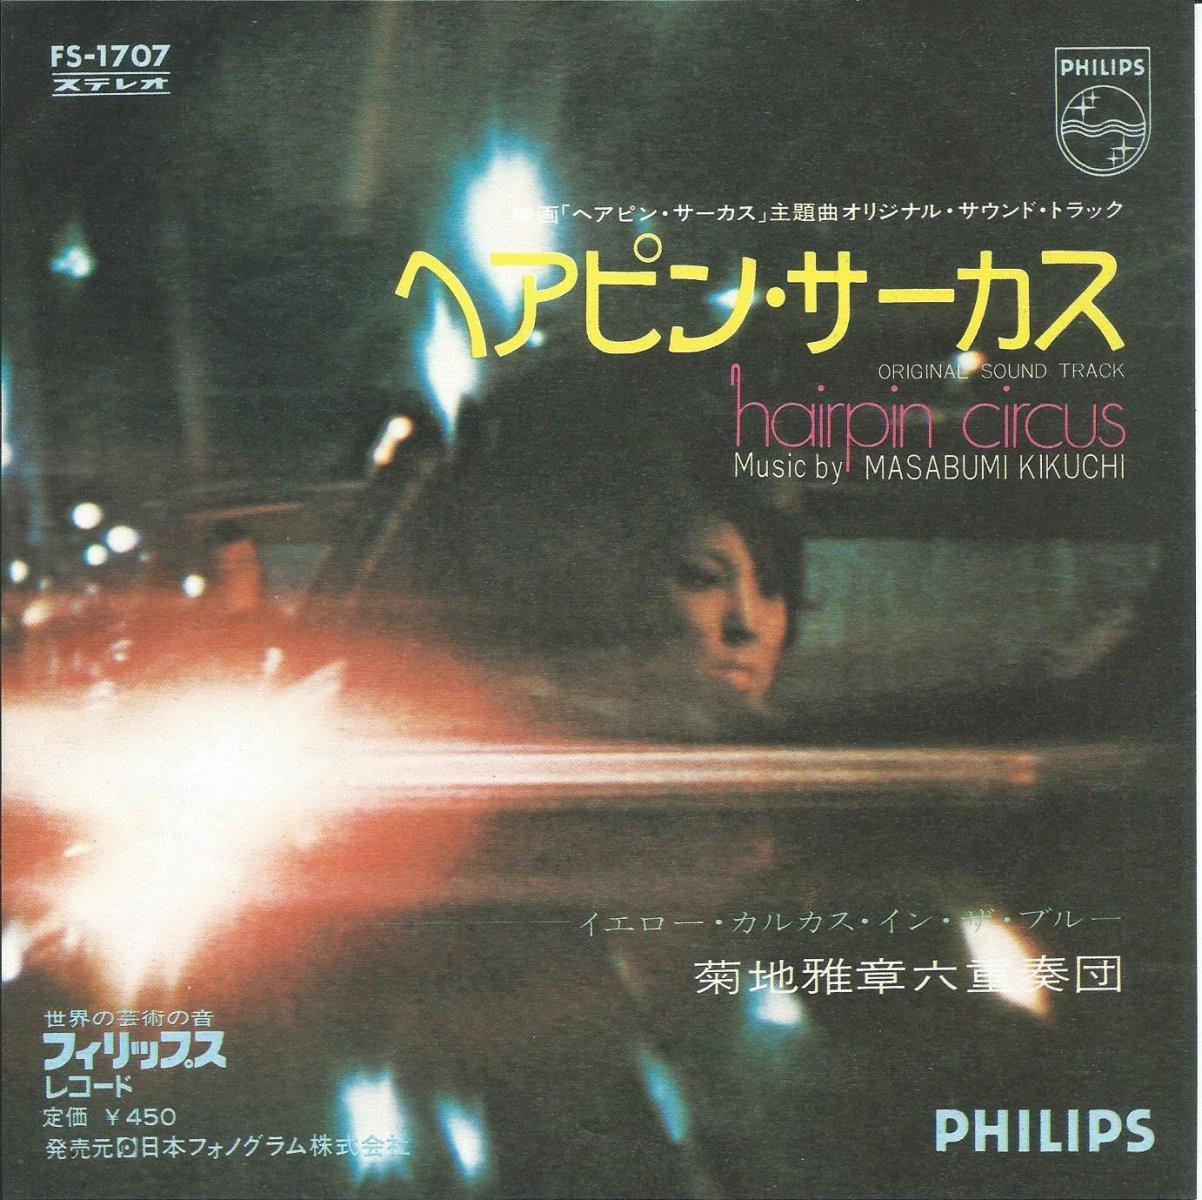 O.S.T.(HAIRPIN CIRCUS) 菊地雅章六重奏団 MASABUMI KIKUCHI SEXTET / ヘアピン・サーカスのテーマ HAIRPIN CIRCUS (7